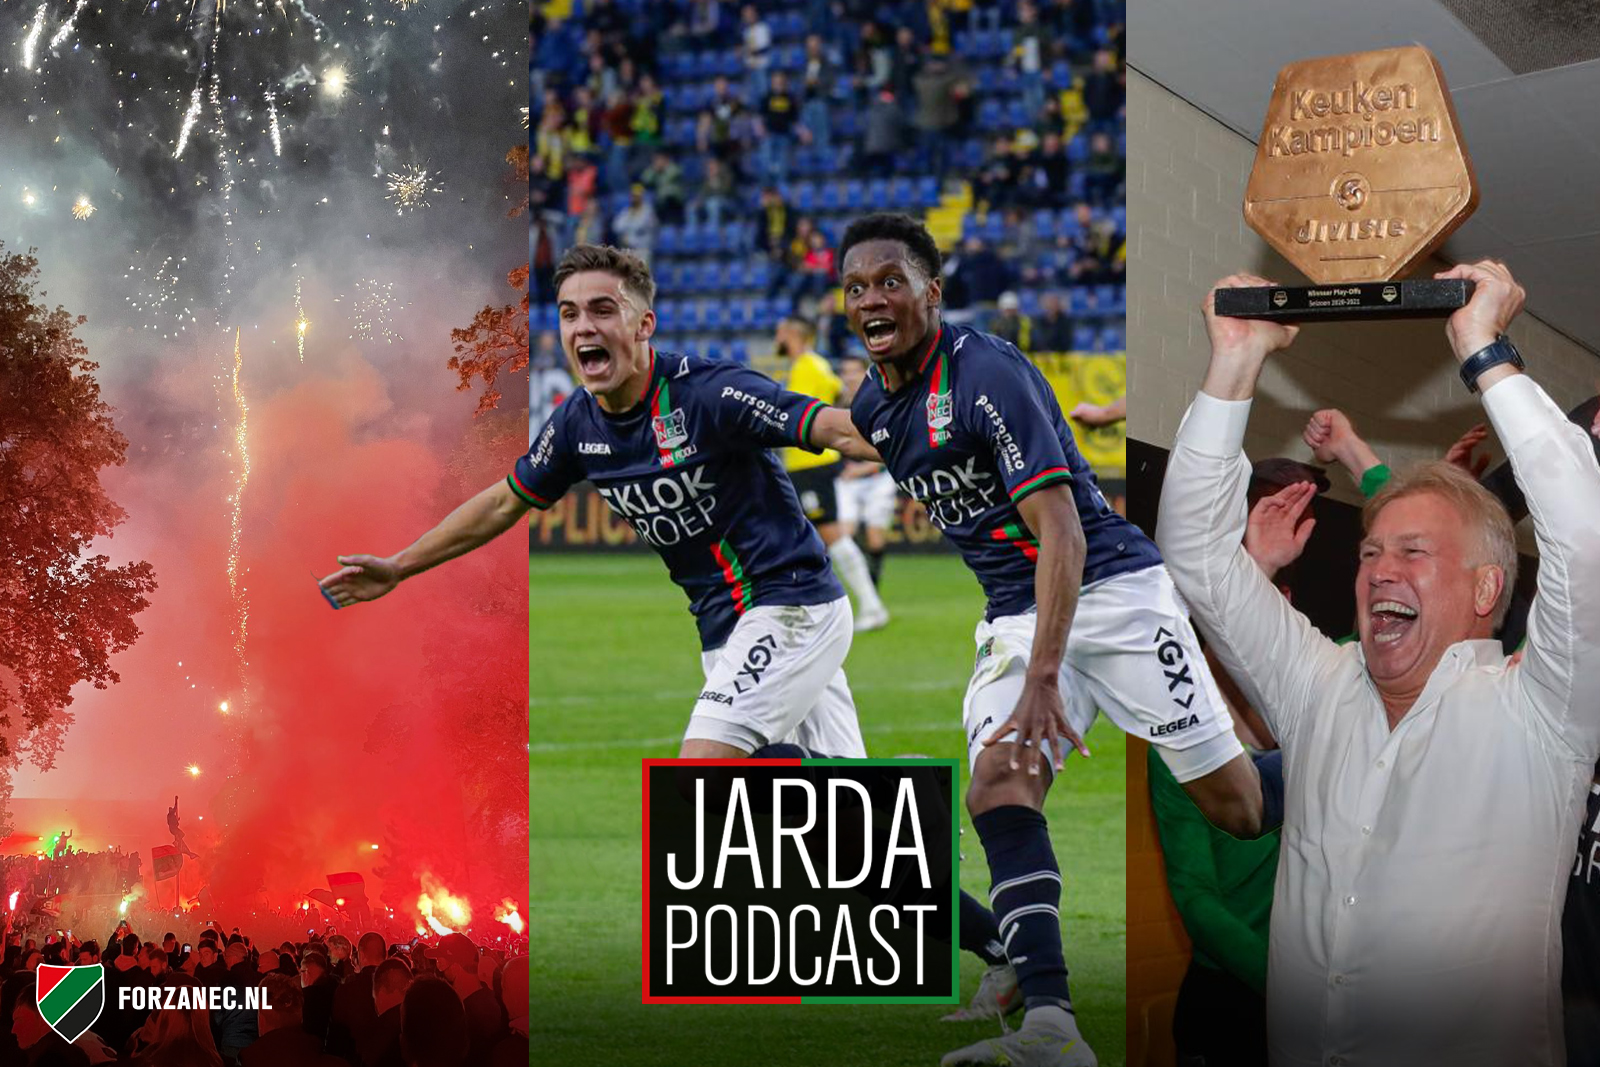 Jarda Podcast #70: EREDIVISIE